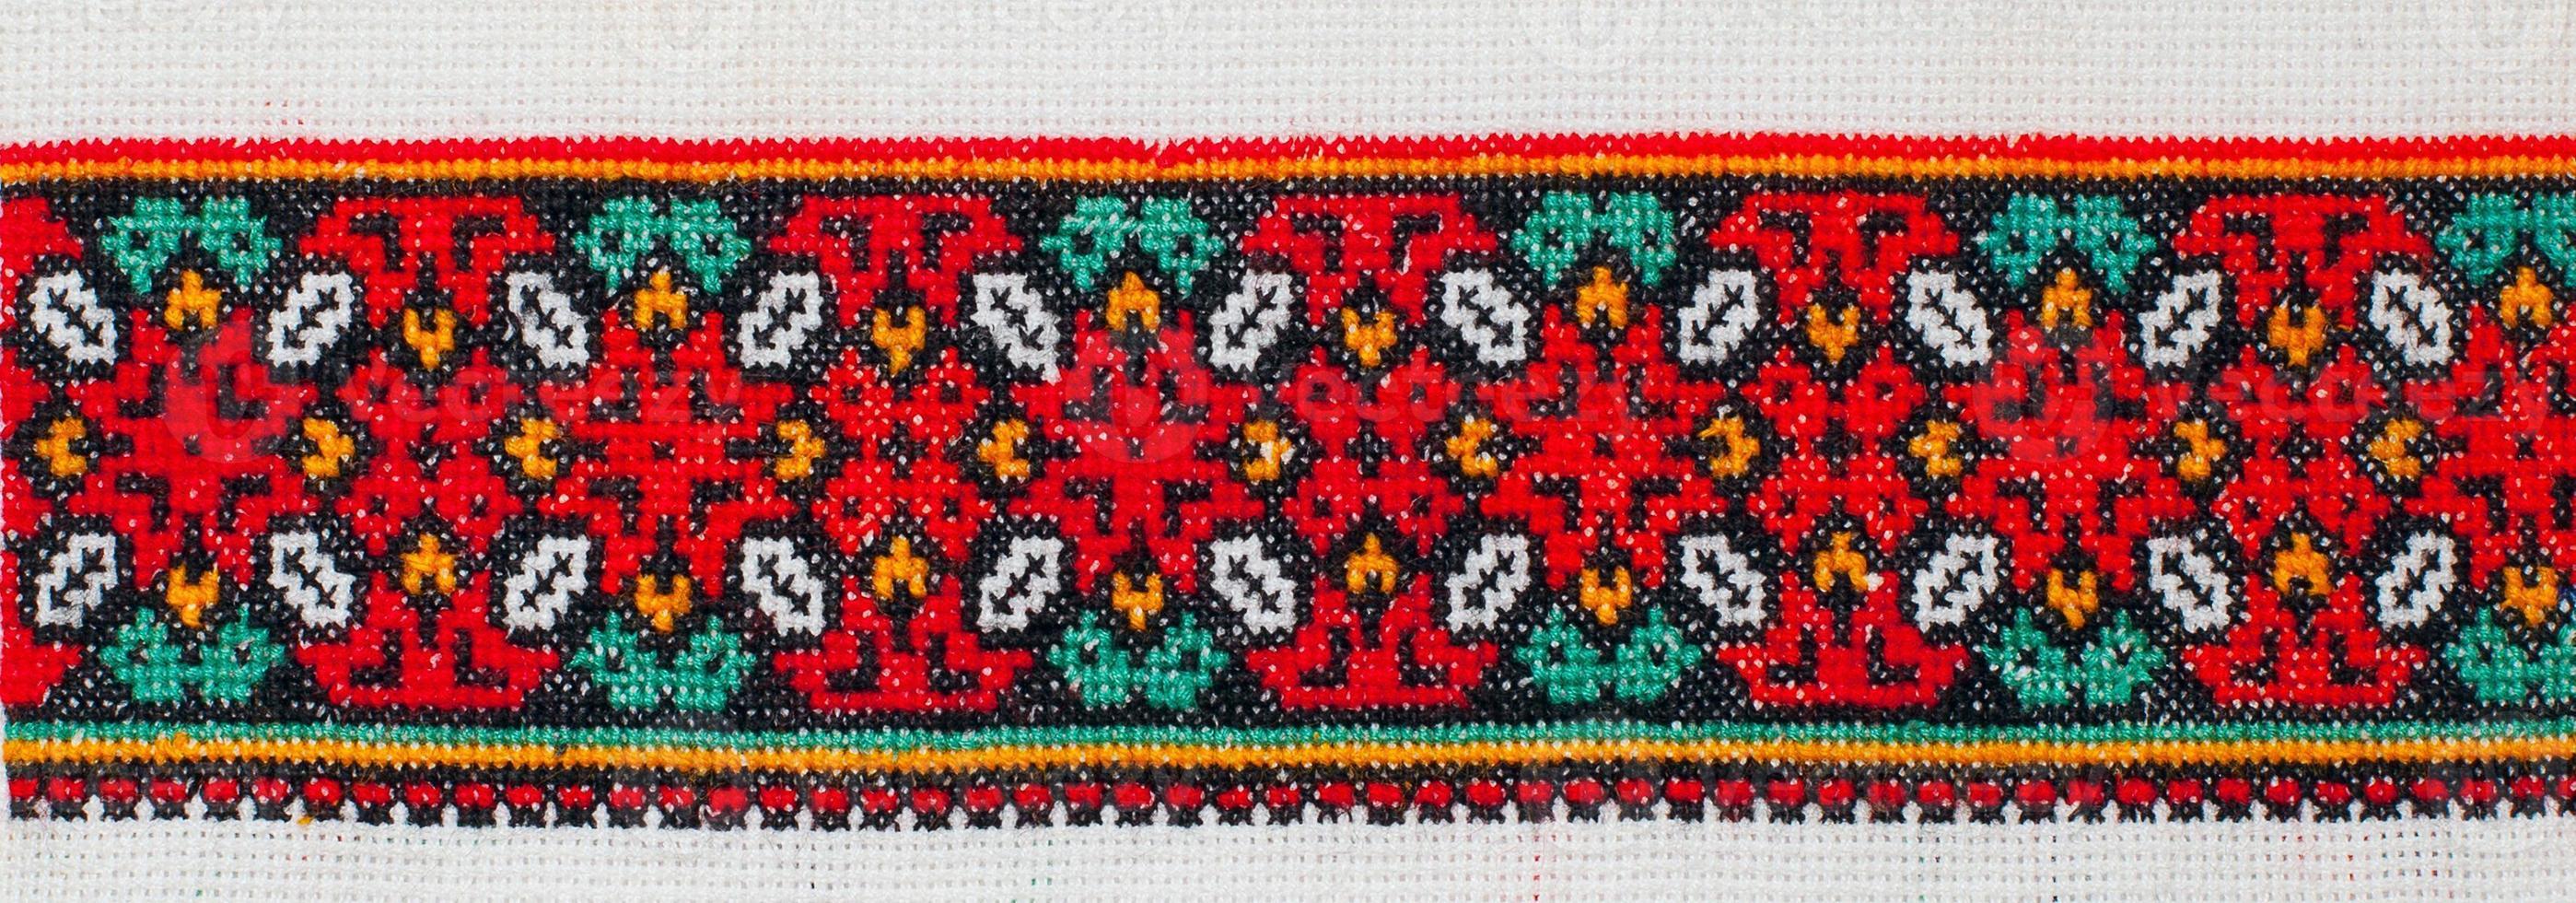 geborduurd kruissteekpatroon. Oekraïens etnisch ornament foto